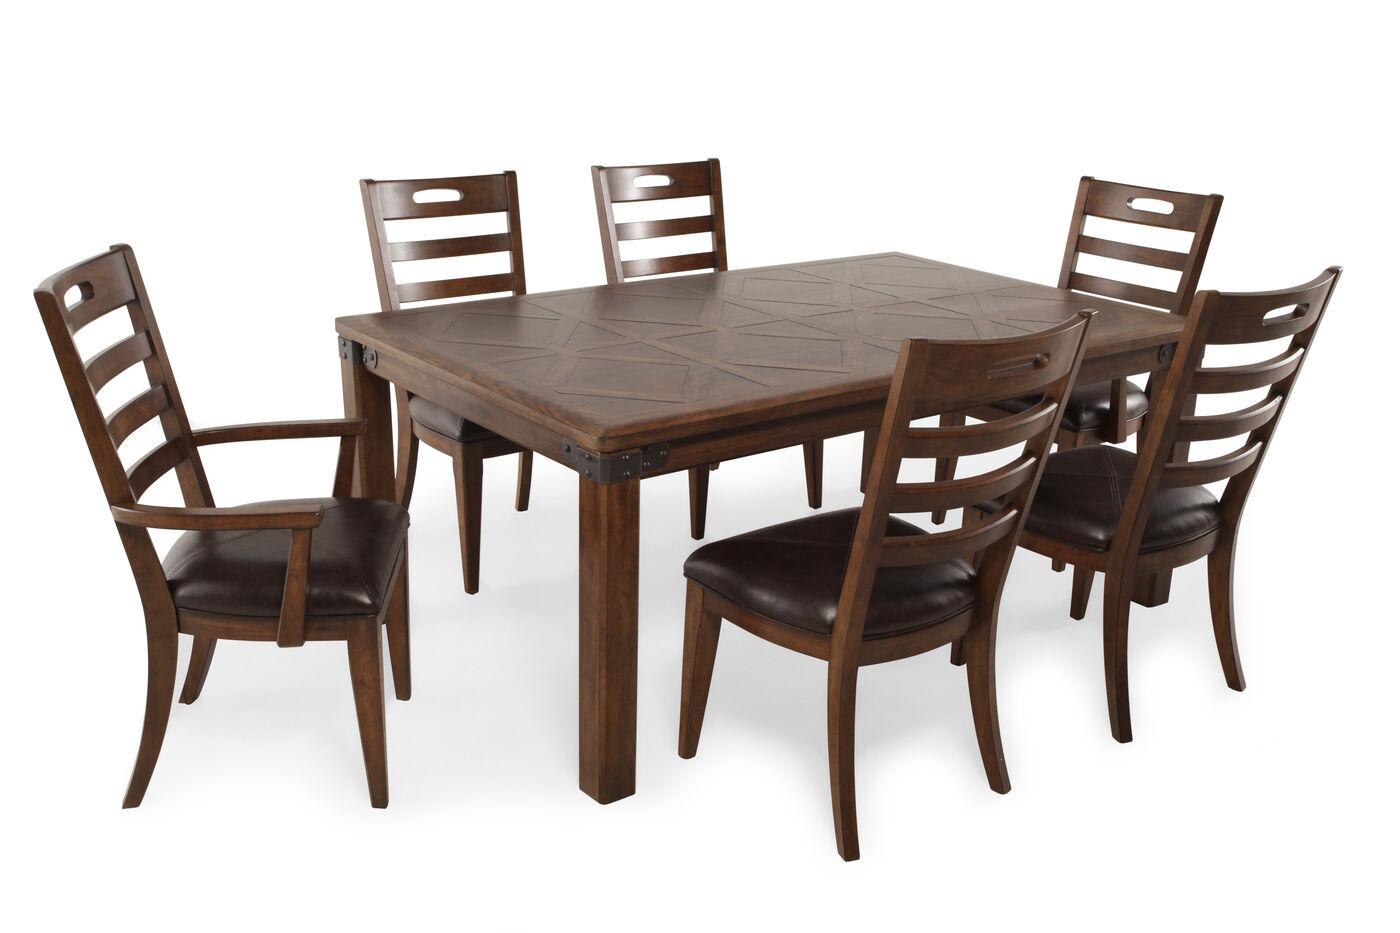 pulaski heartland falls seven piece dining set mathis